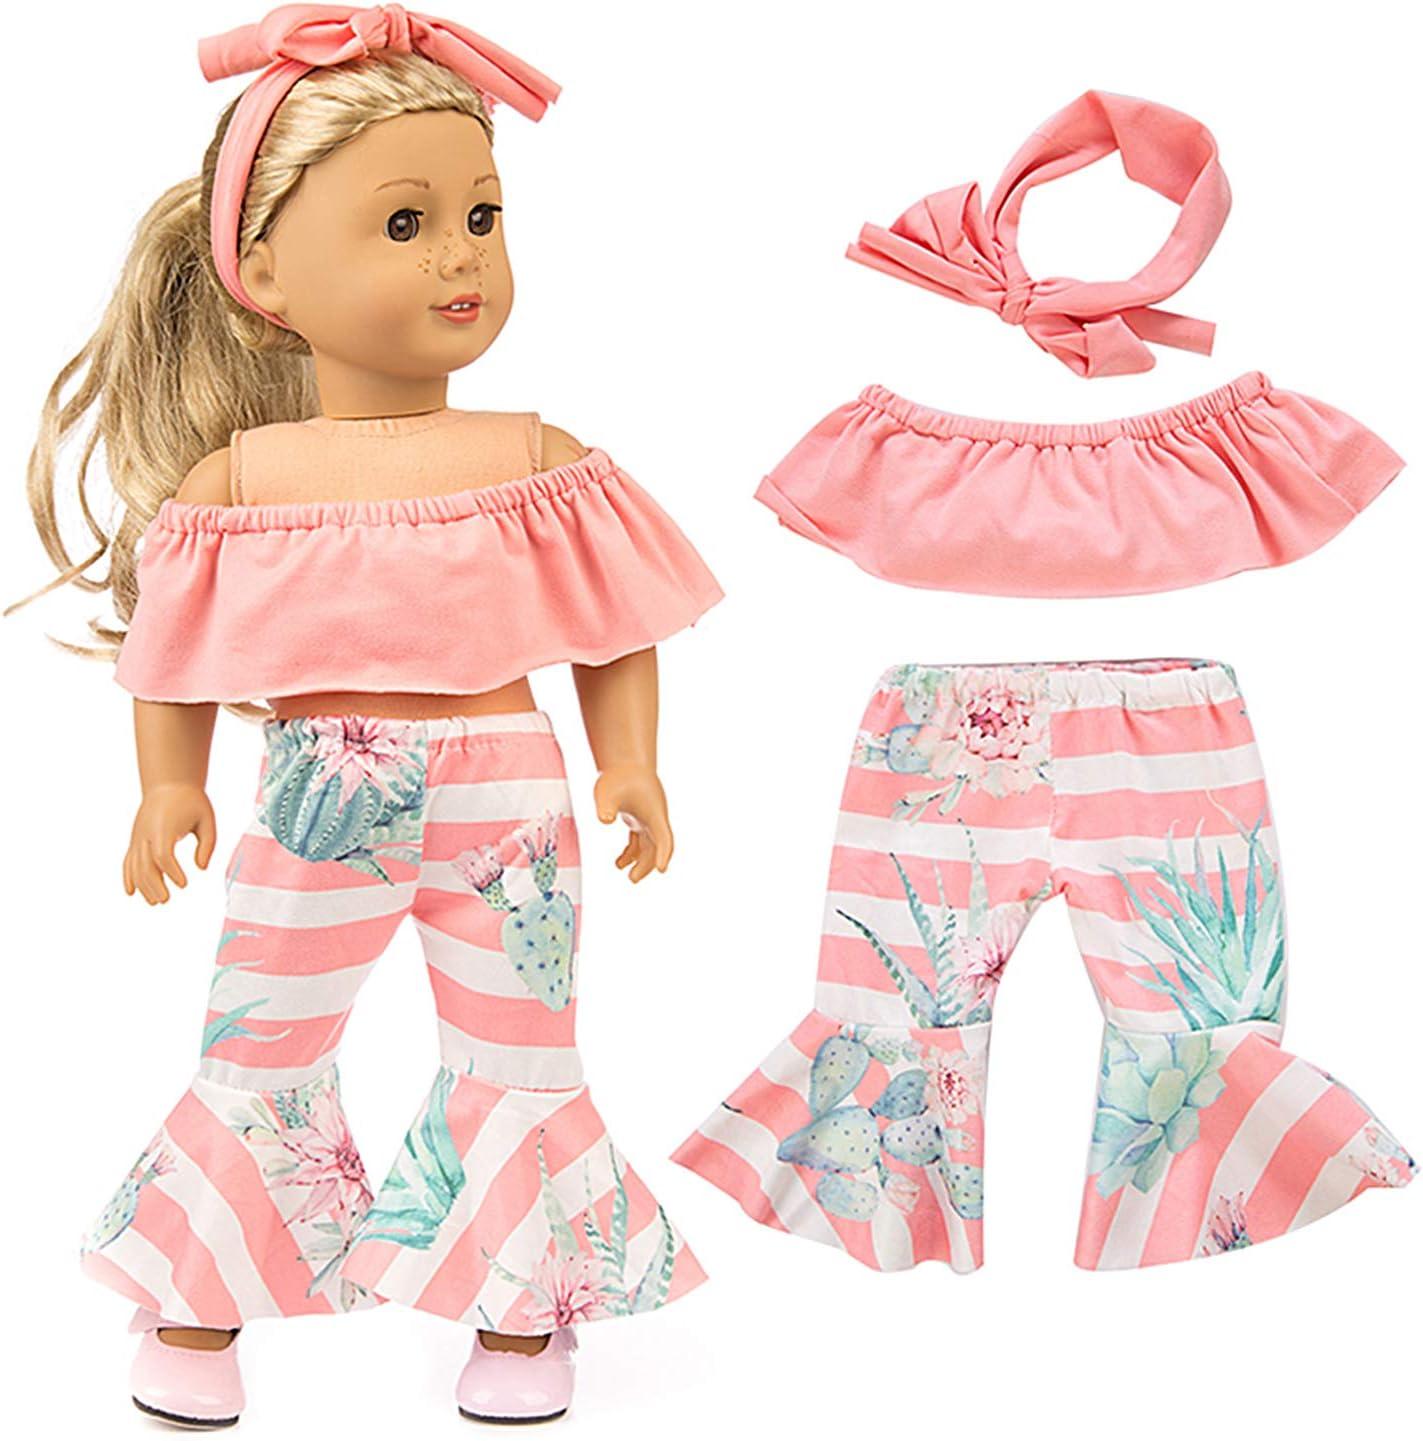 Cute Girl Zebra Print 2pcs Pajamas Fits American Girl Doll 18 inch doll clothes